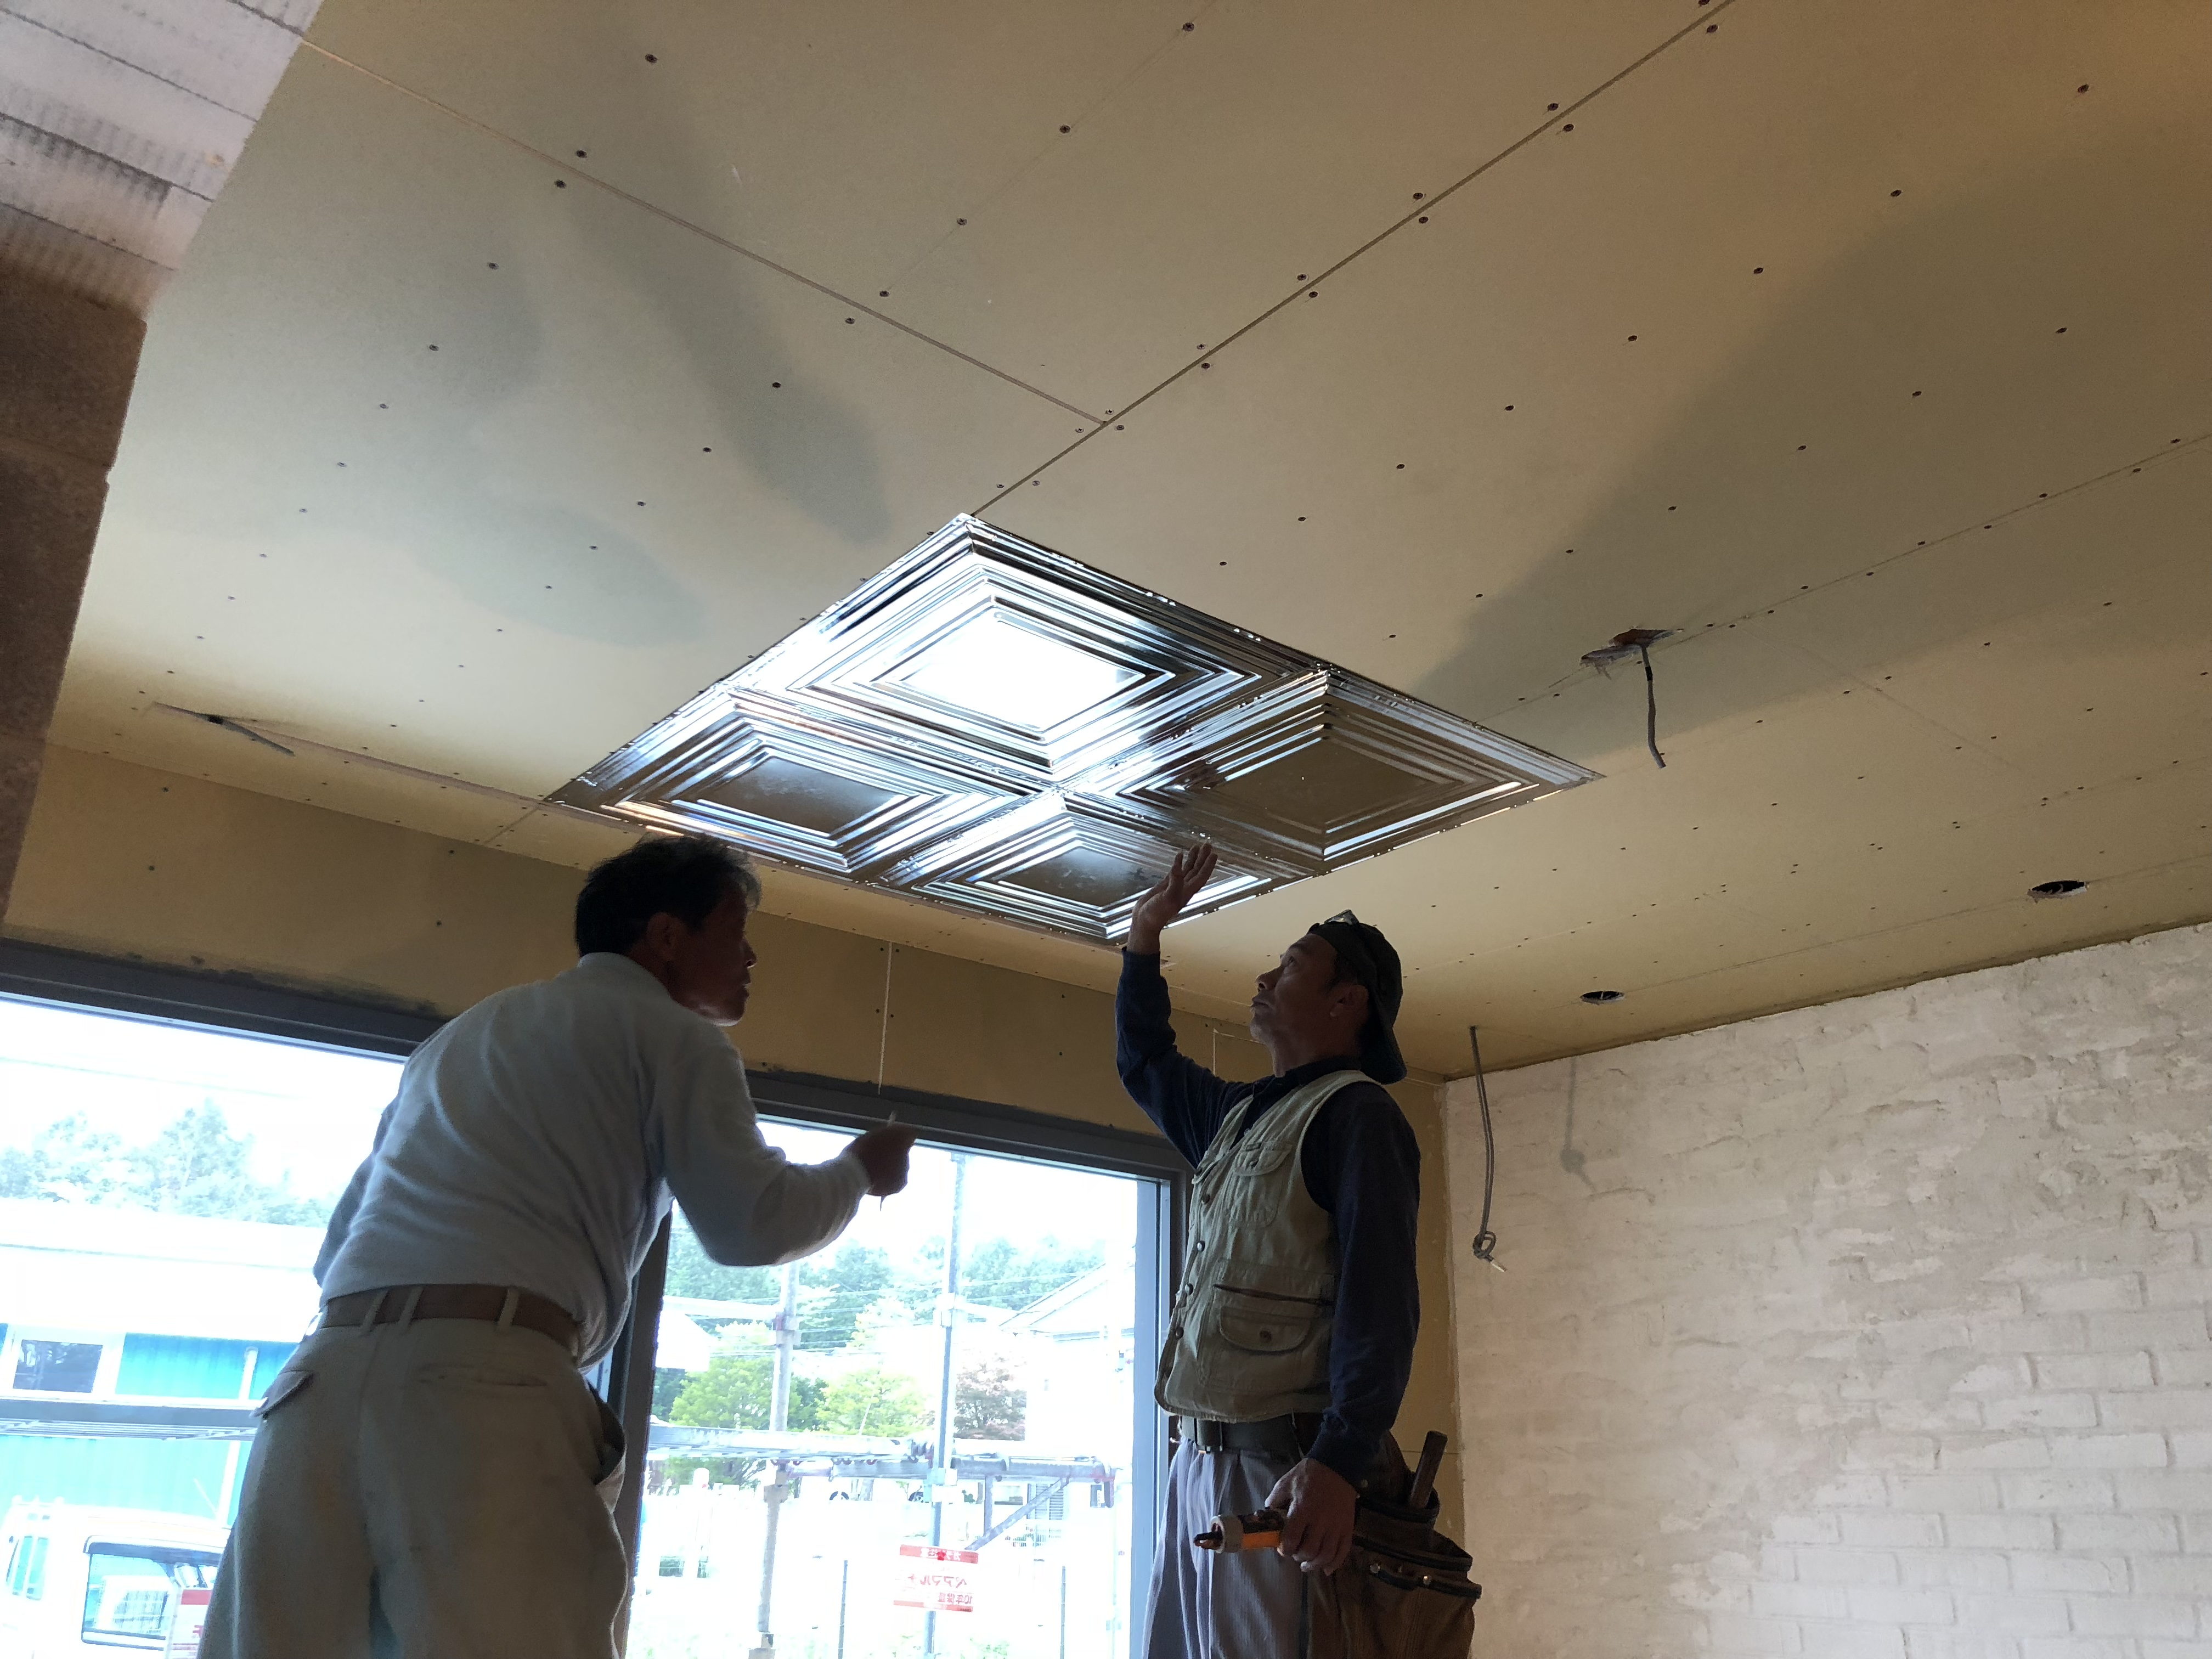 山梨の工務店、未来建築工房の注文住宅。新社屋の天井。輸入建材を施行中。